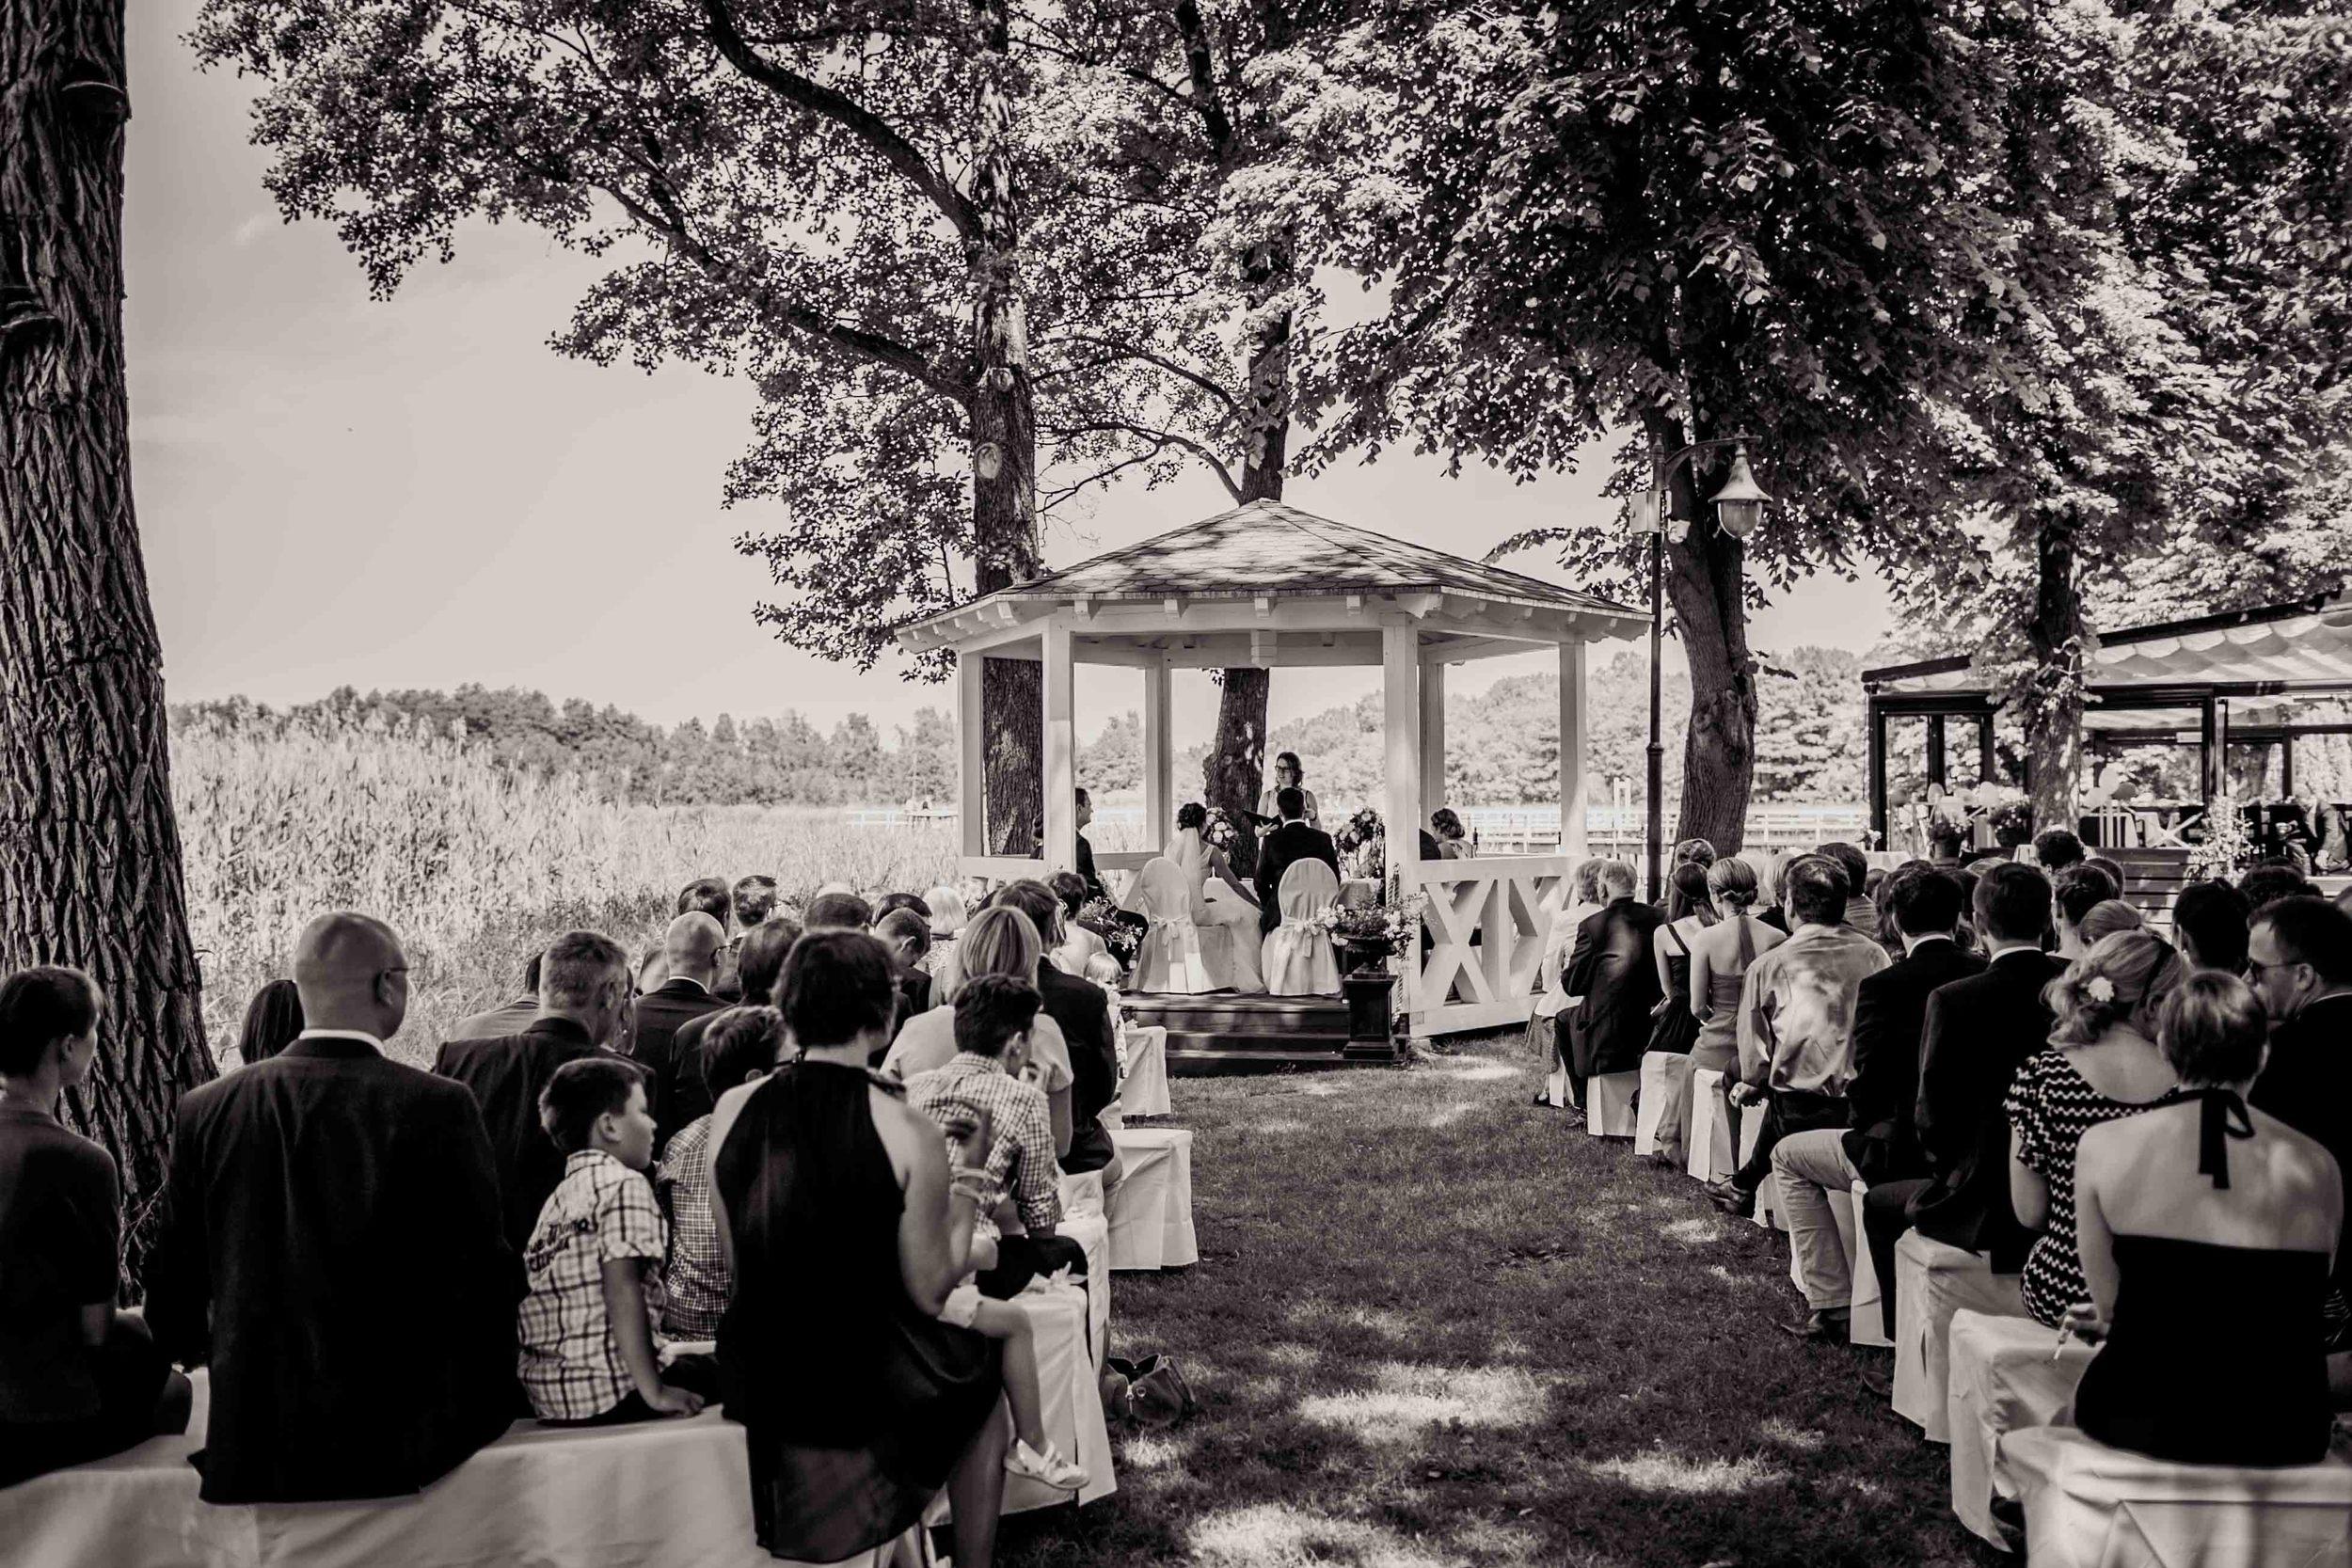 Hochzeitsfotografie Berlin_Fran Burrows Fotografie-5.jpg